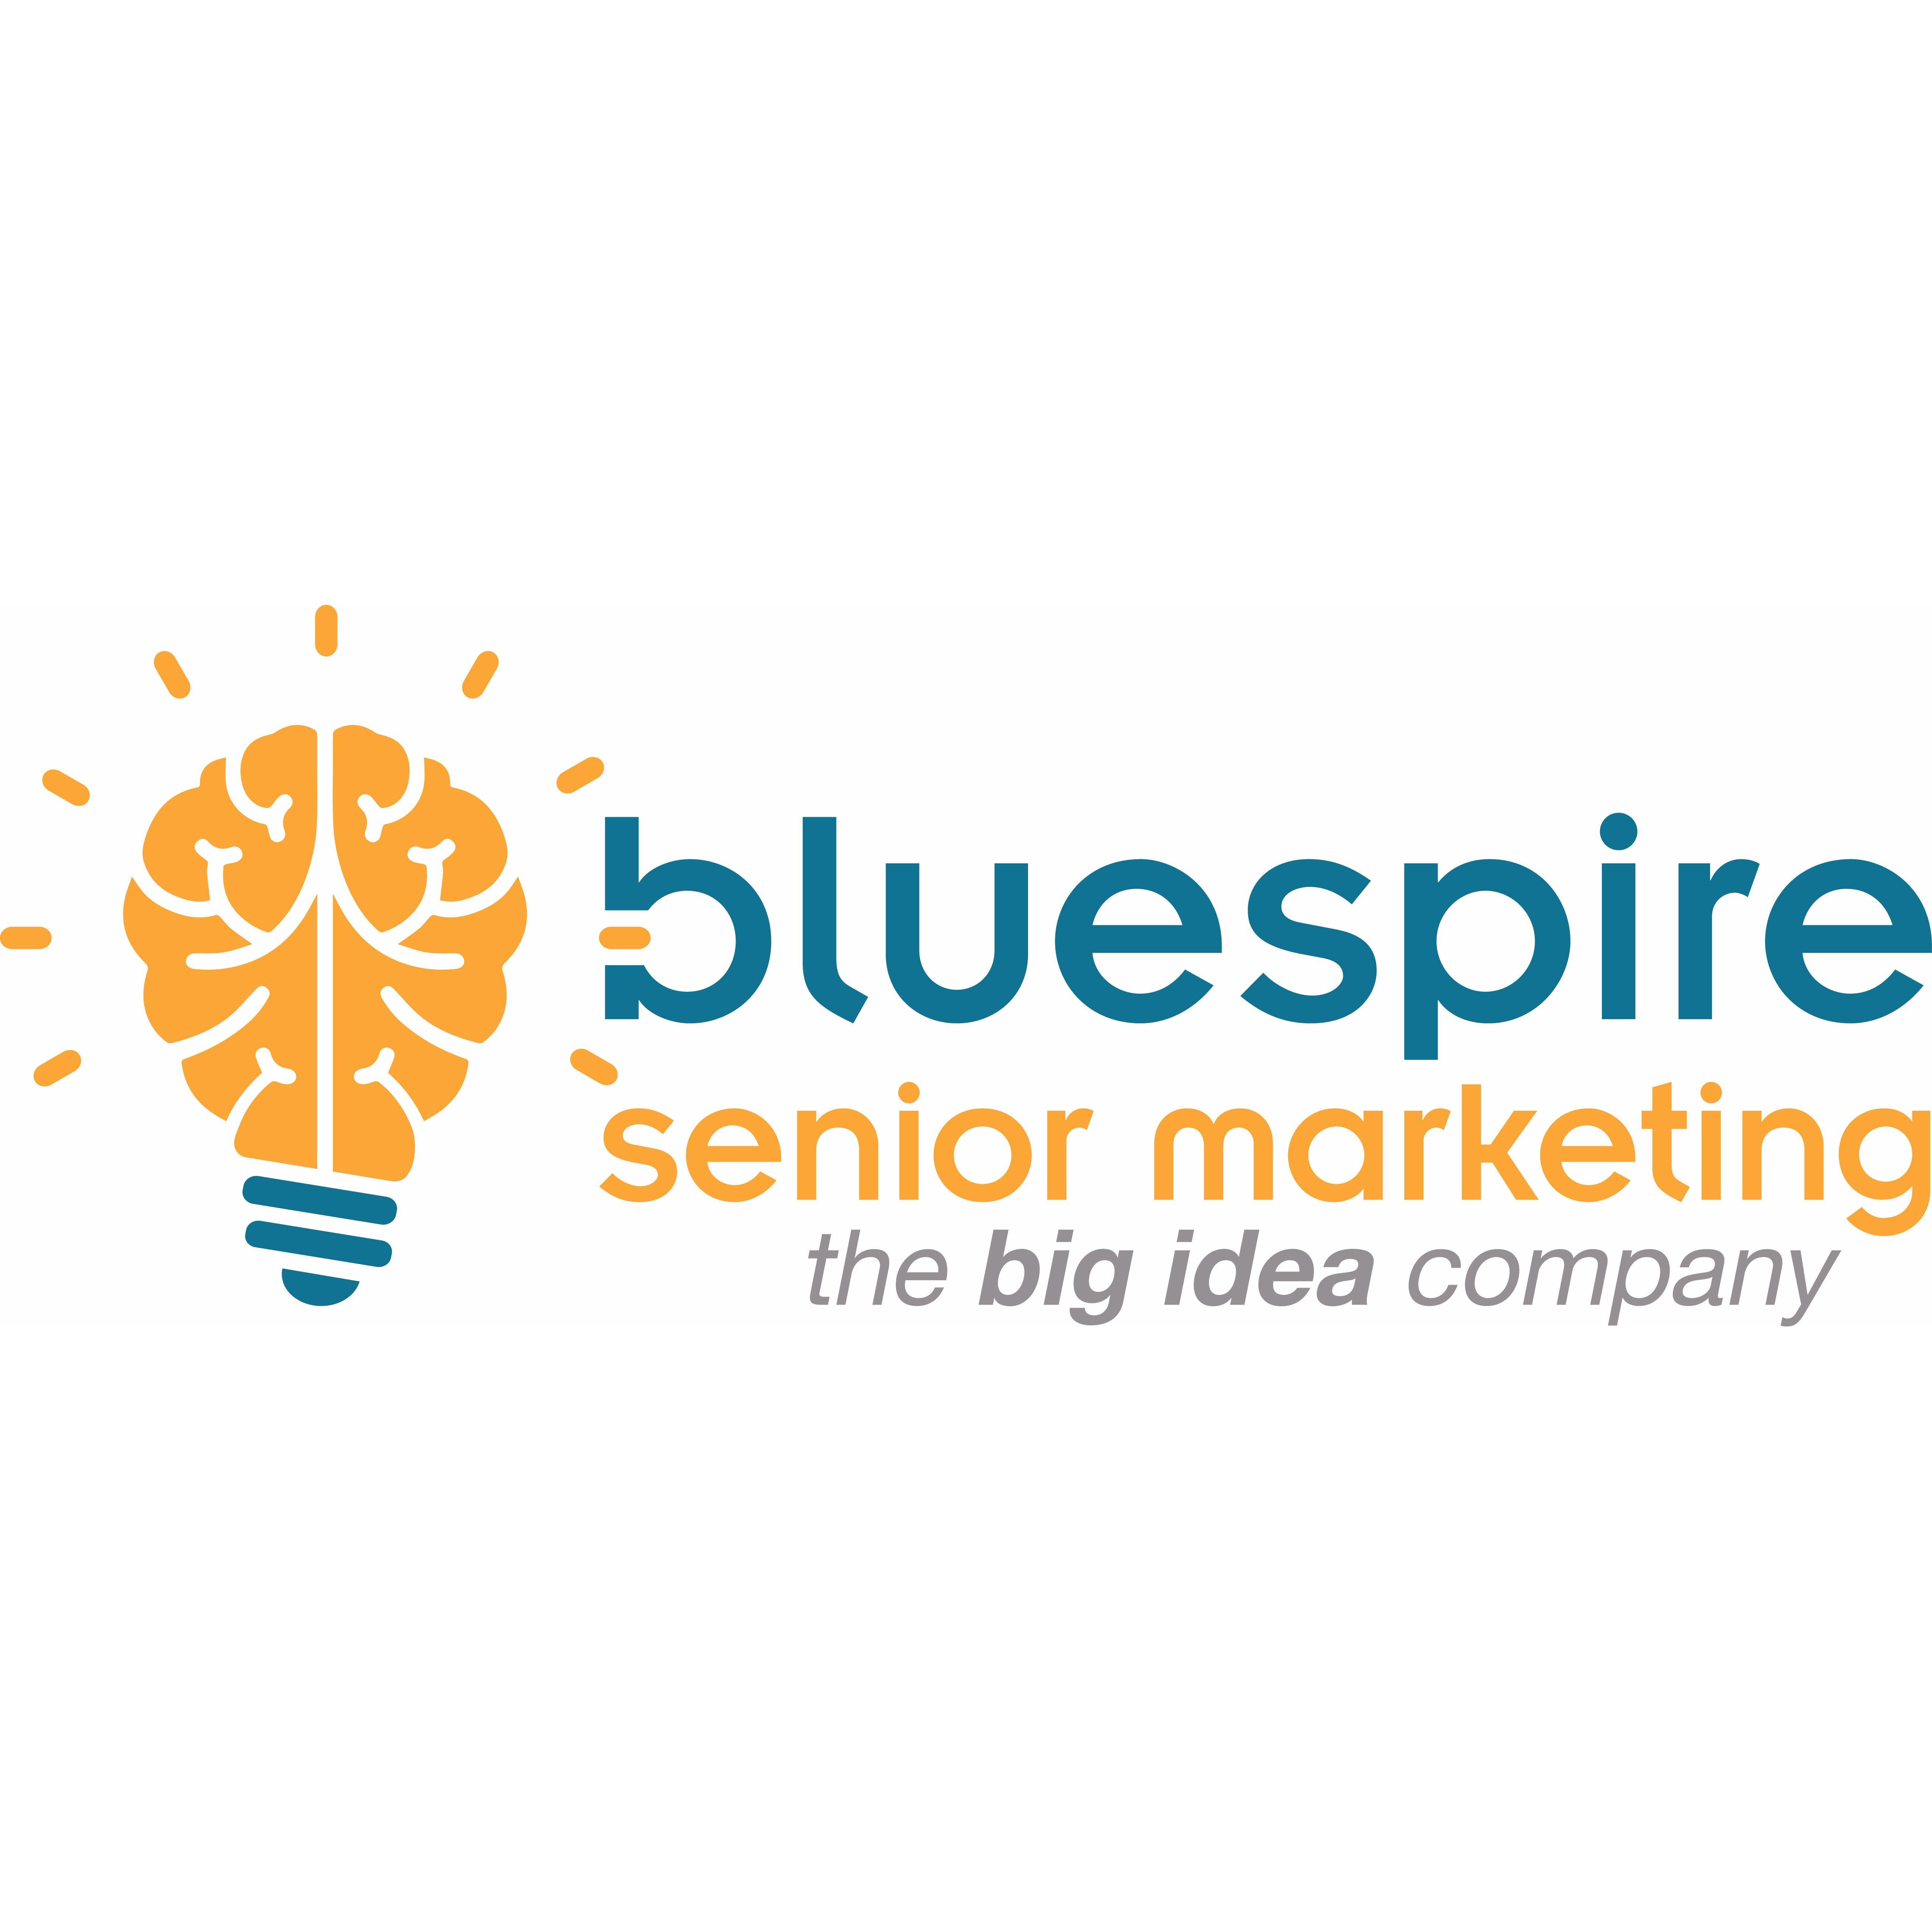 Bluespire Senior Marketing